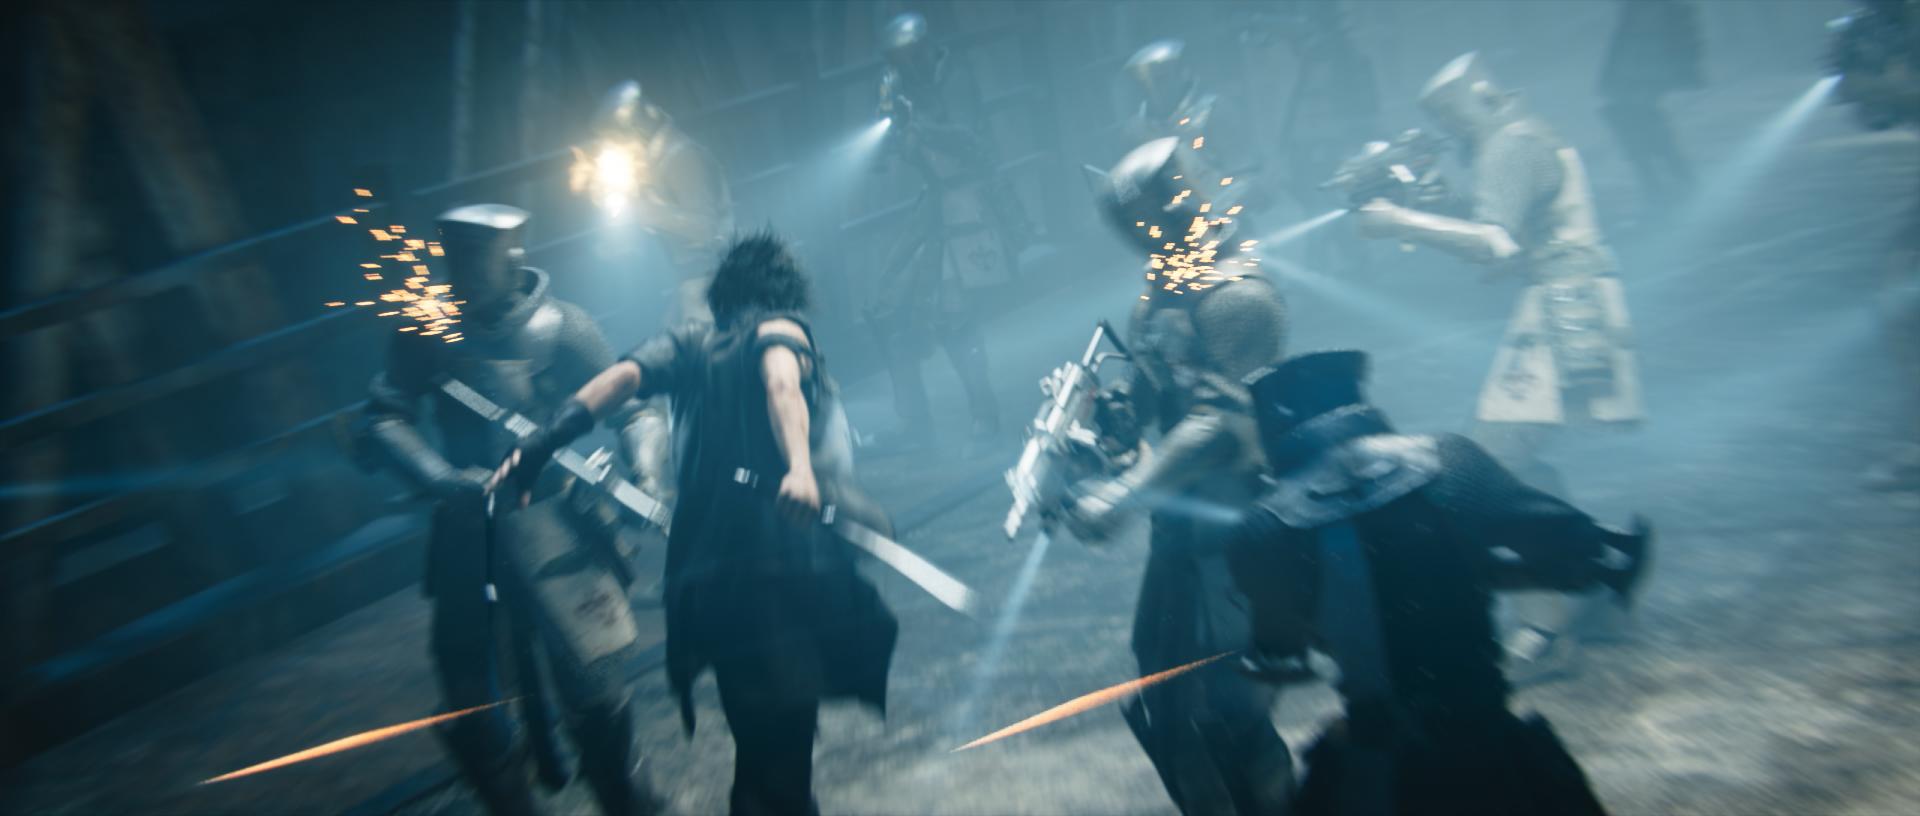 Noctis Has A Terrible Premonition In This Final Fantasy 15 Conceptual Dream Sequence Trailer VG247